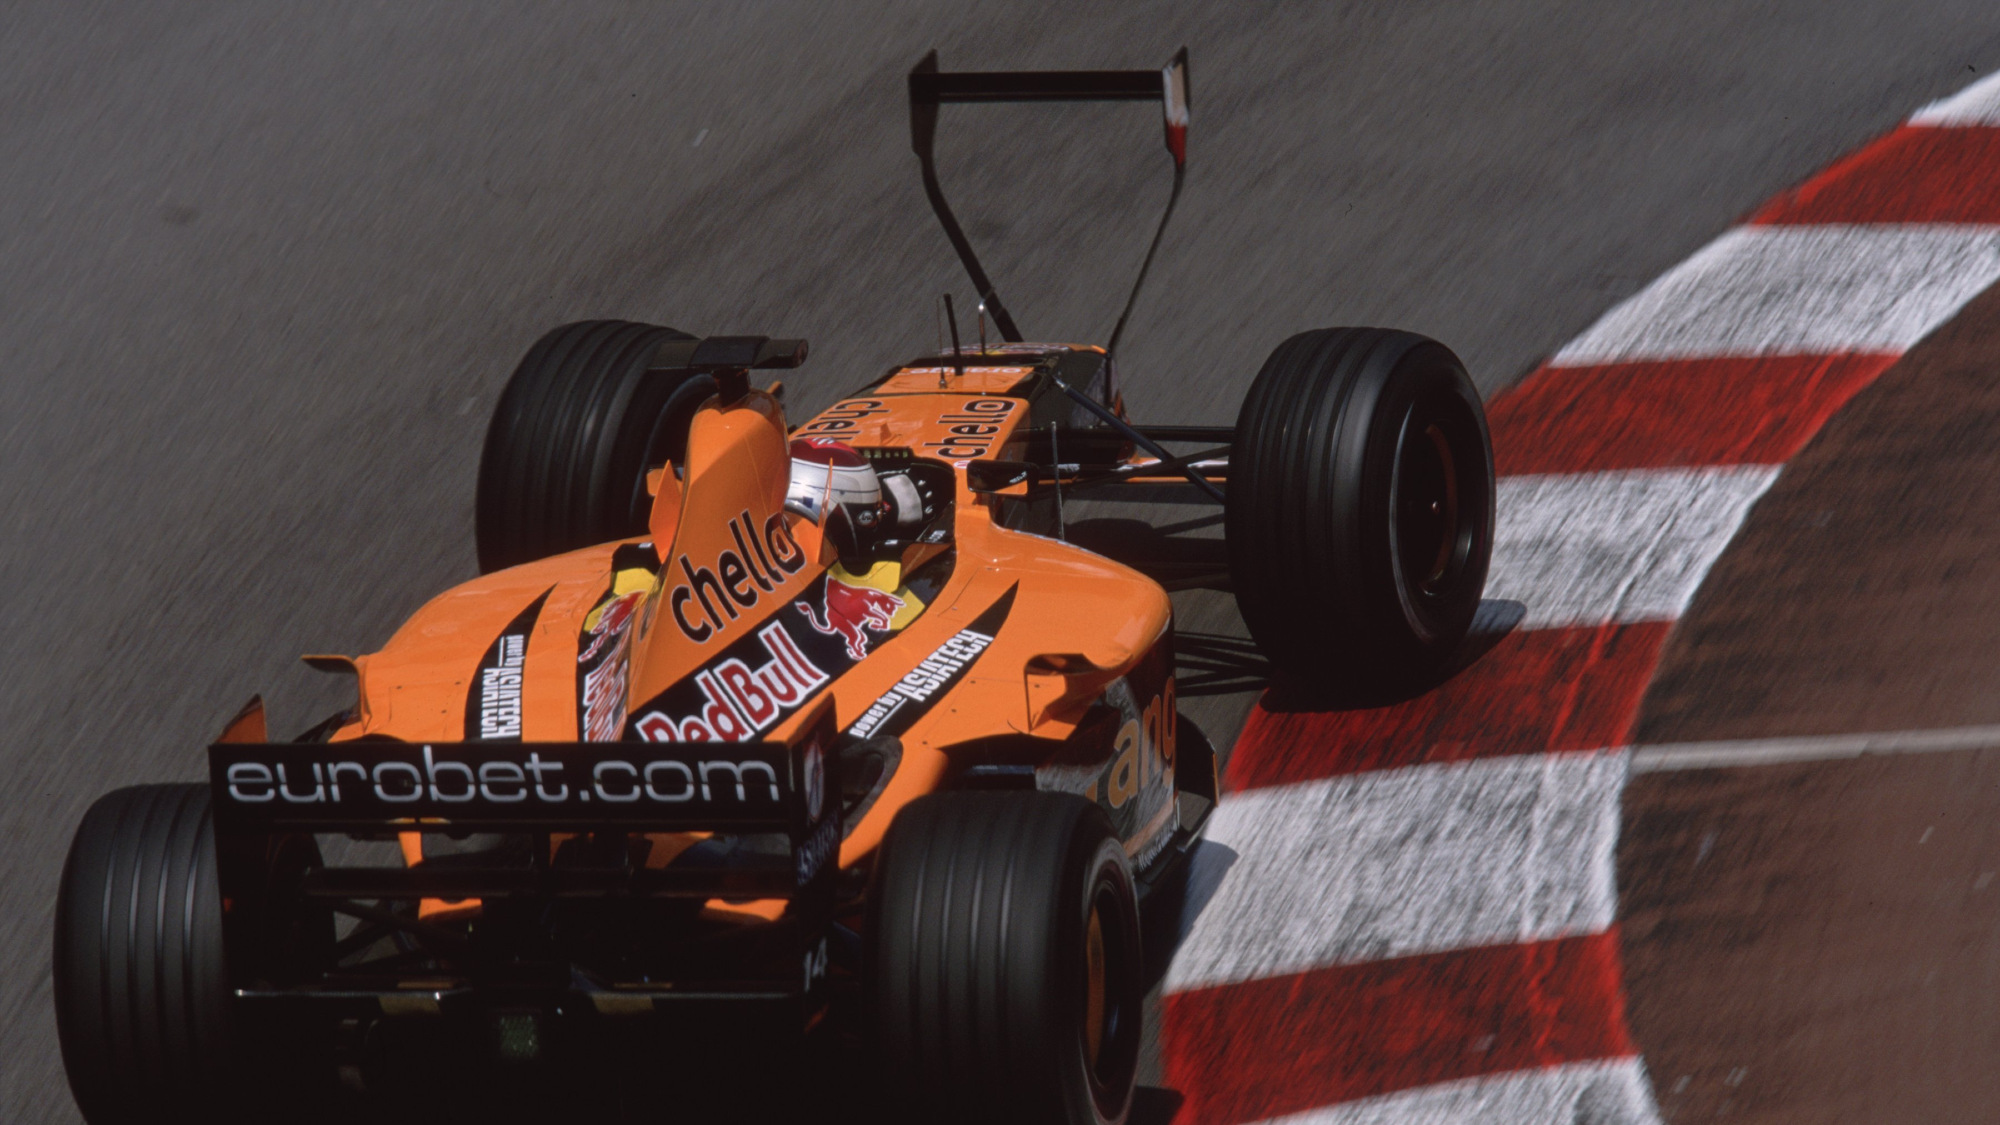 2001 Monaco GP, Jos Verstappen